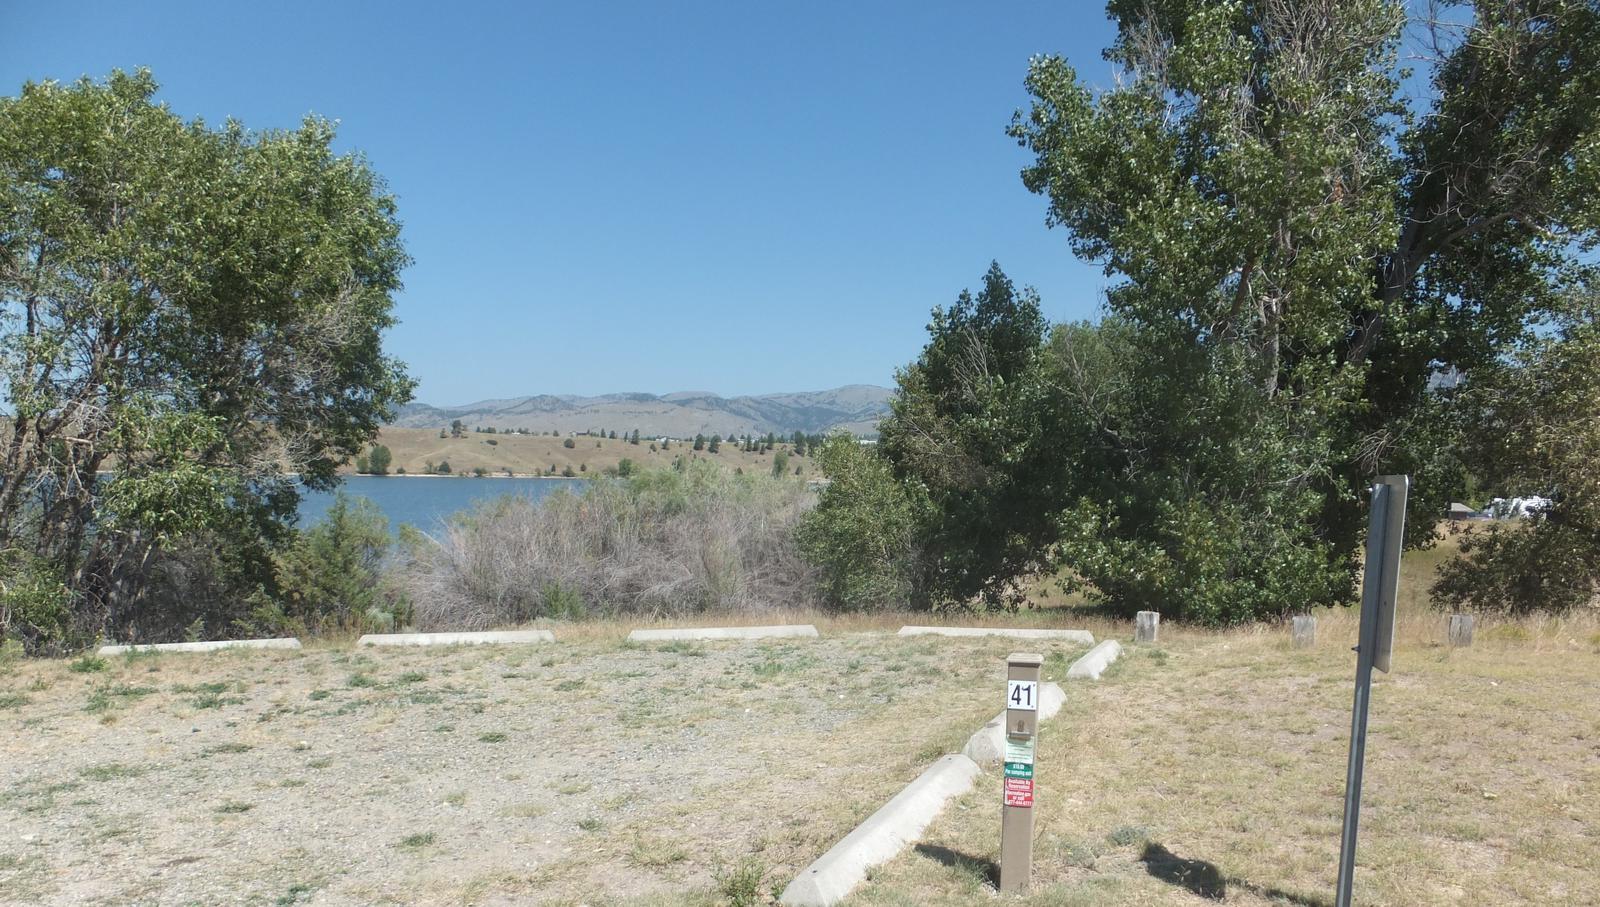 Hellgate Campground - Campsite 41